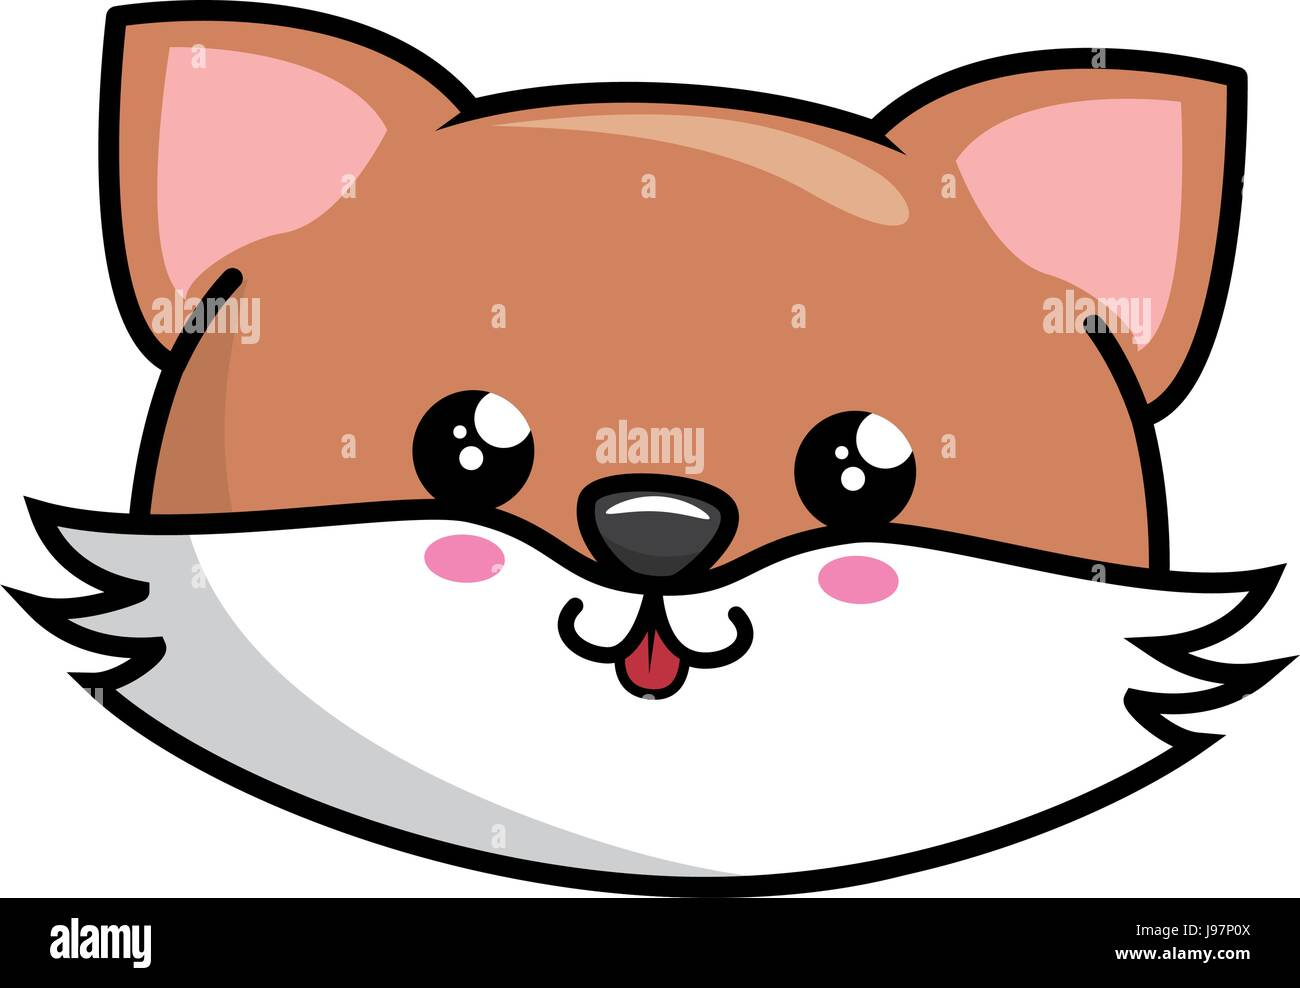 Uncategorized Kawaii Fox kawaii fox icon stock vector art illustration image icon